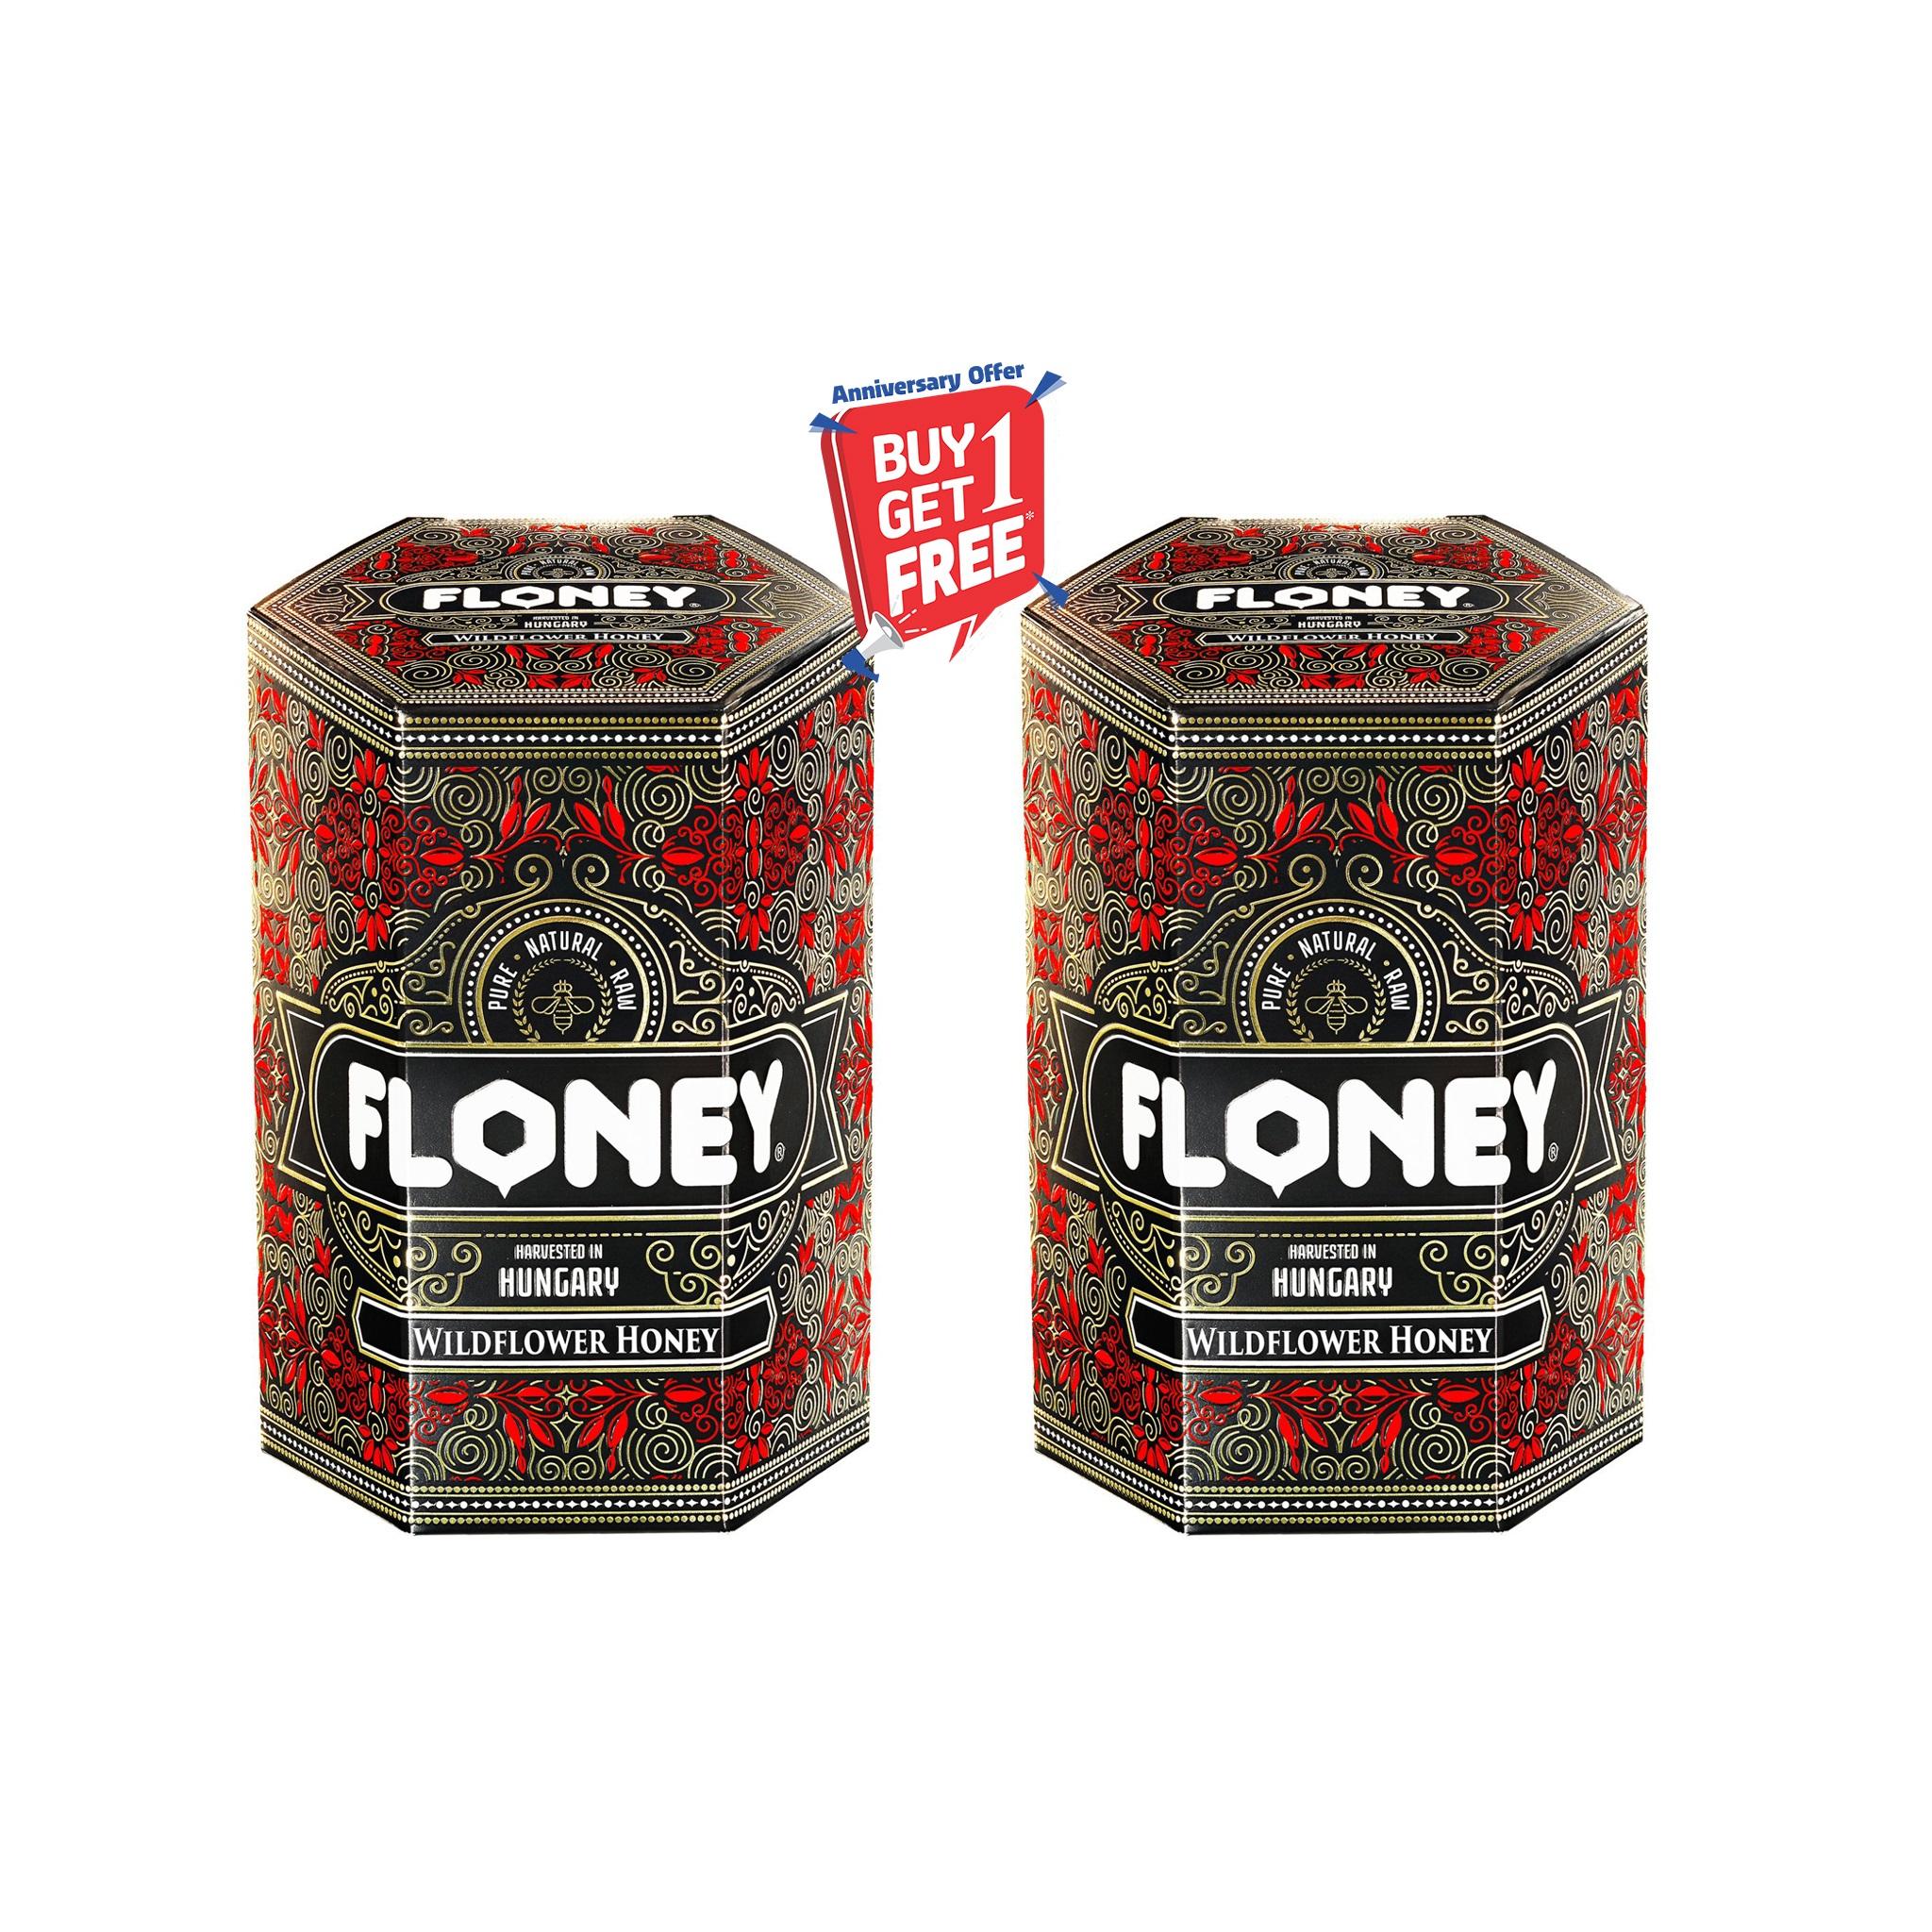 Floney Wild Flower Honey 250 gm Buy 1 Get 1 Free